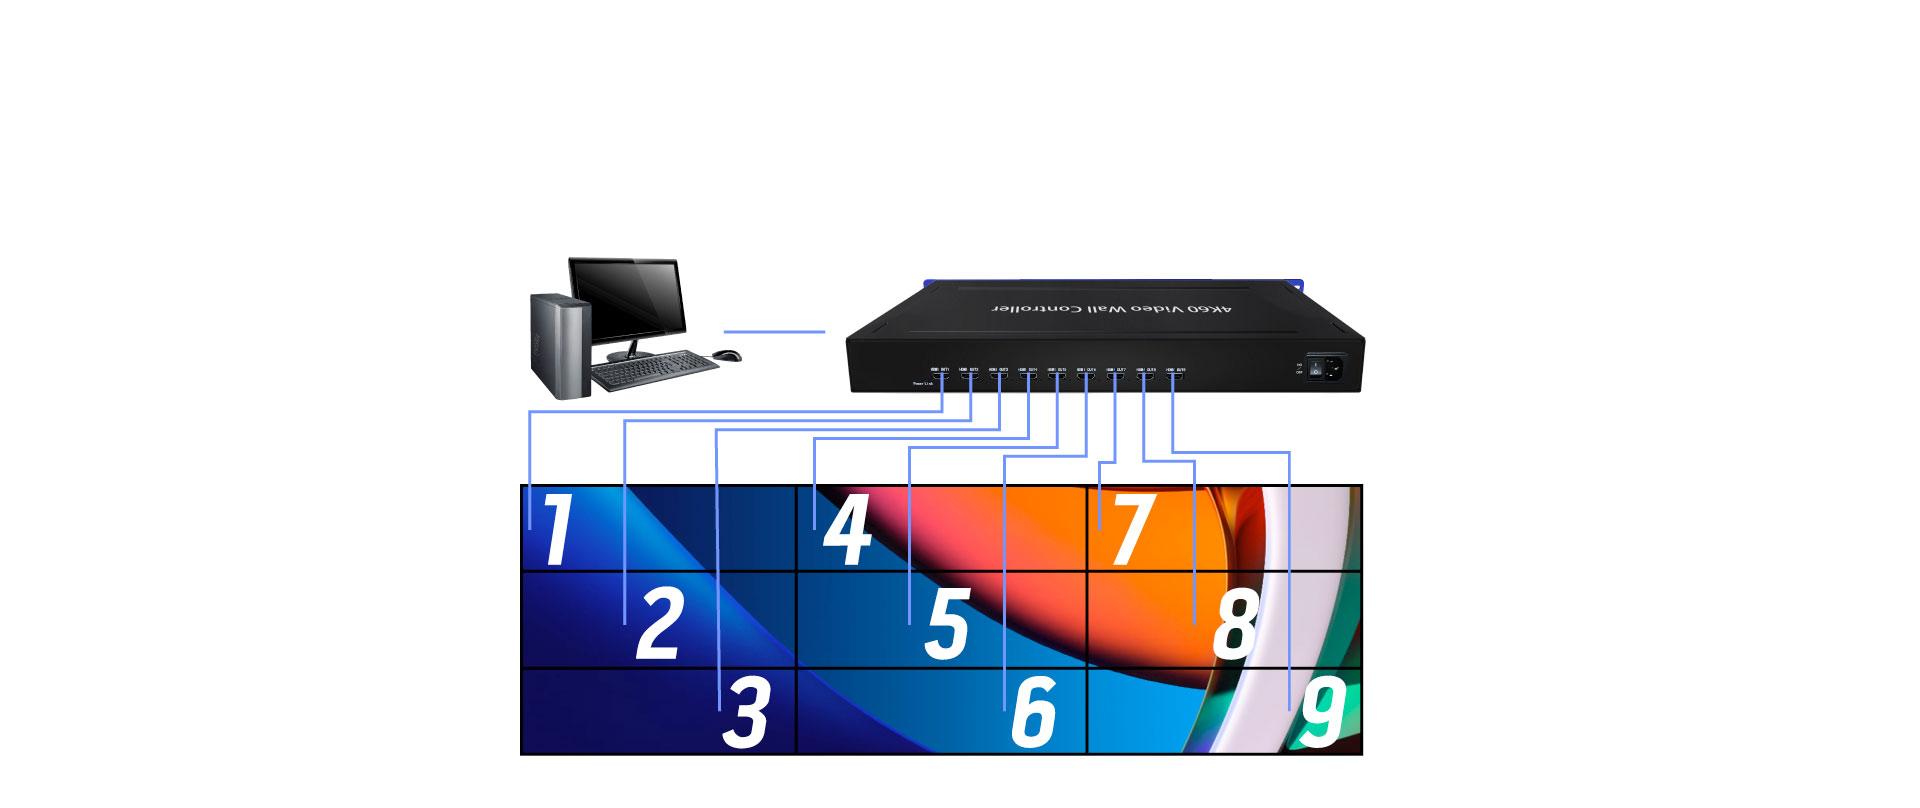 iWall 409R 4K60 Video Wall Controller